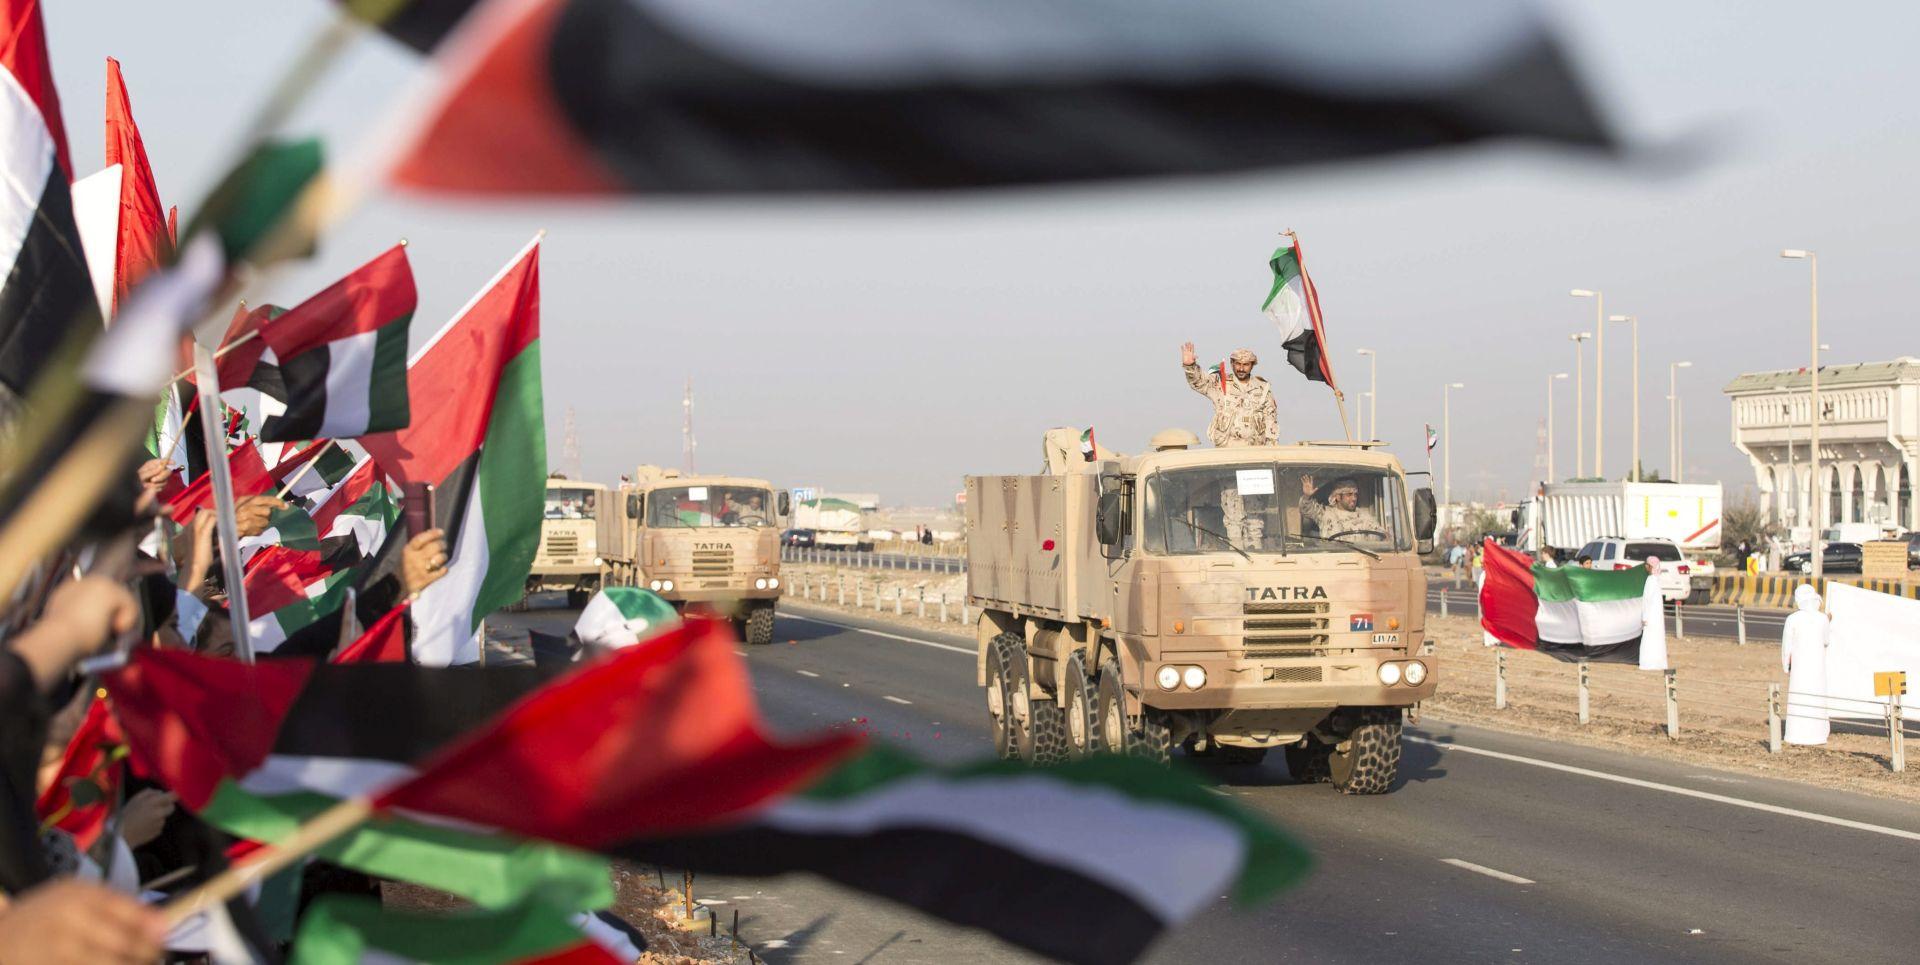 POLICIJSKI TRENING KAMP U AMMANU Jordanski policajac upucao dva američka instruktora i južnoafričkog policajca